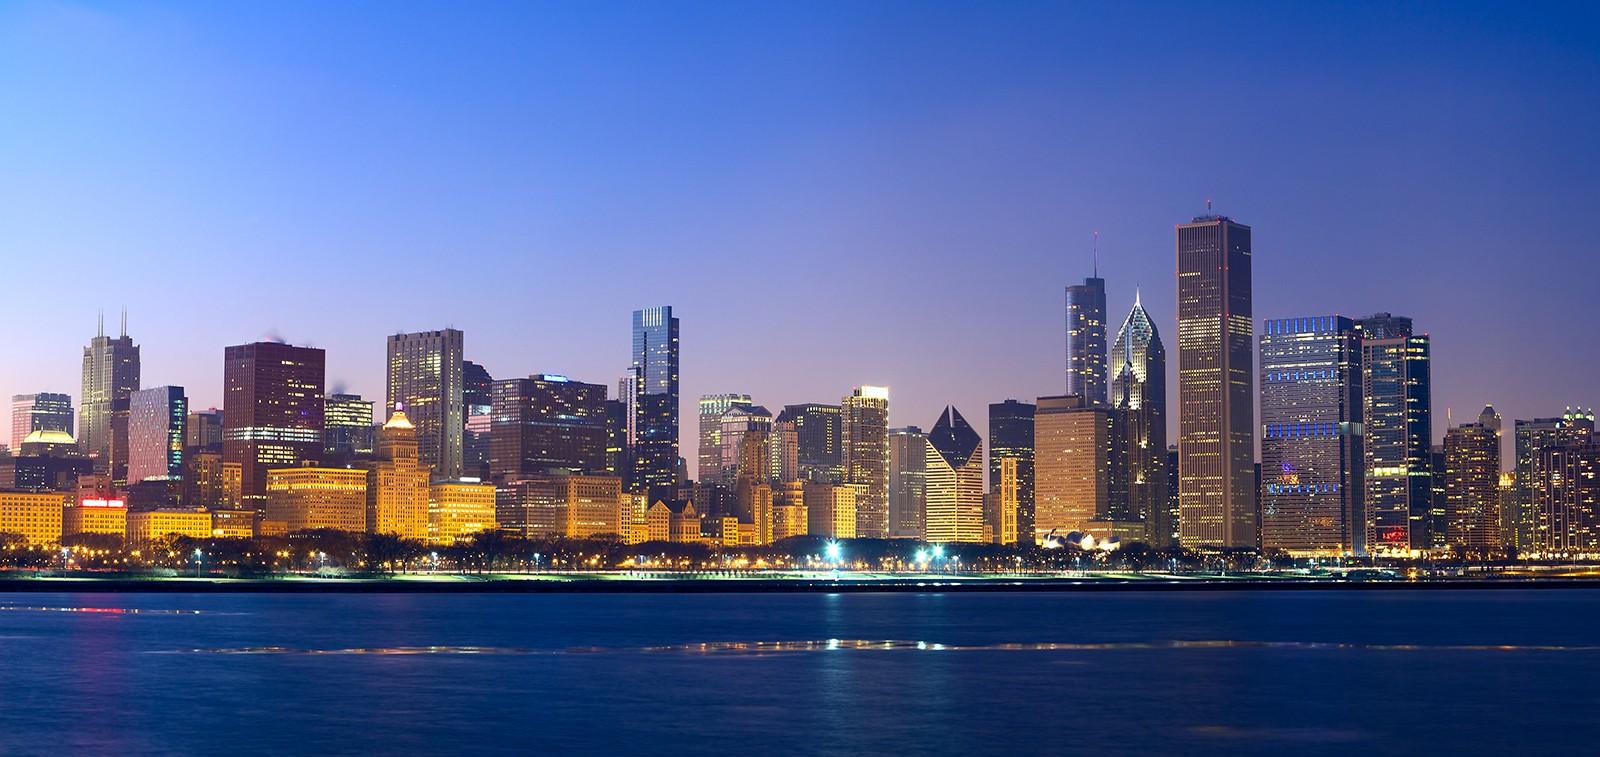 رحلات القاهرة شيكاغو مع ترافكو هوليدايز